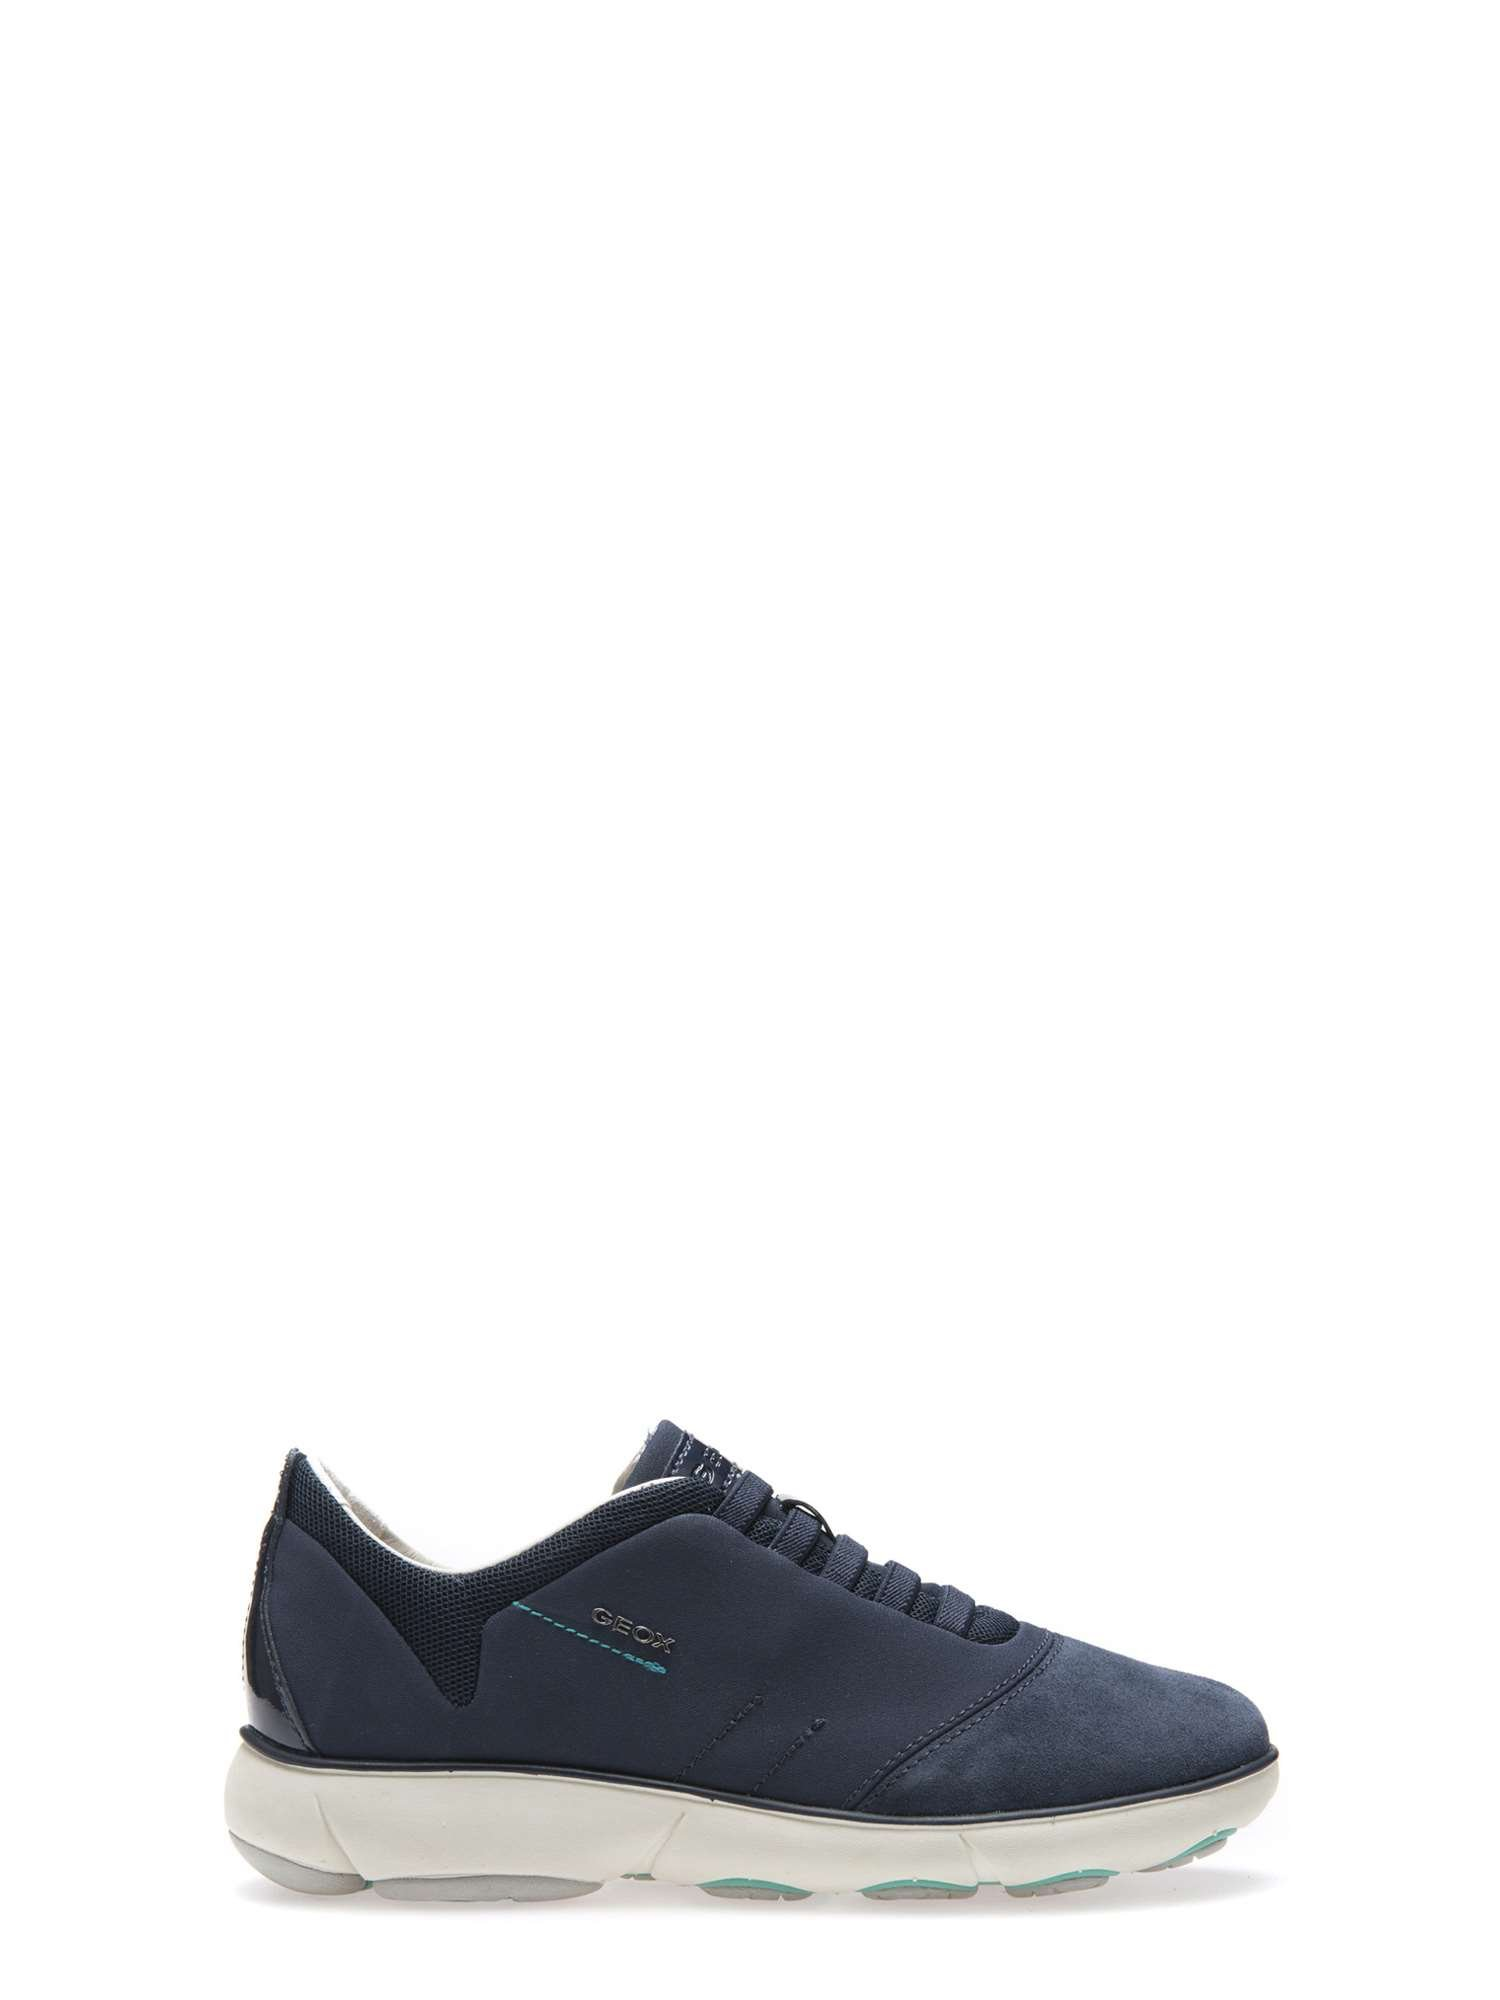 Geox D NEBULA C, Damen Low-Top Sneakers 1